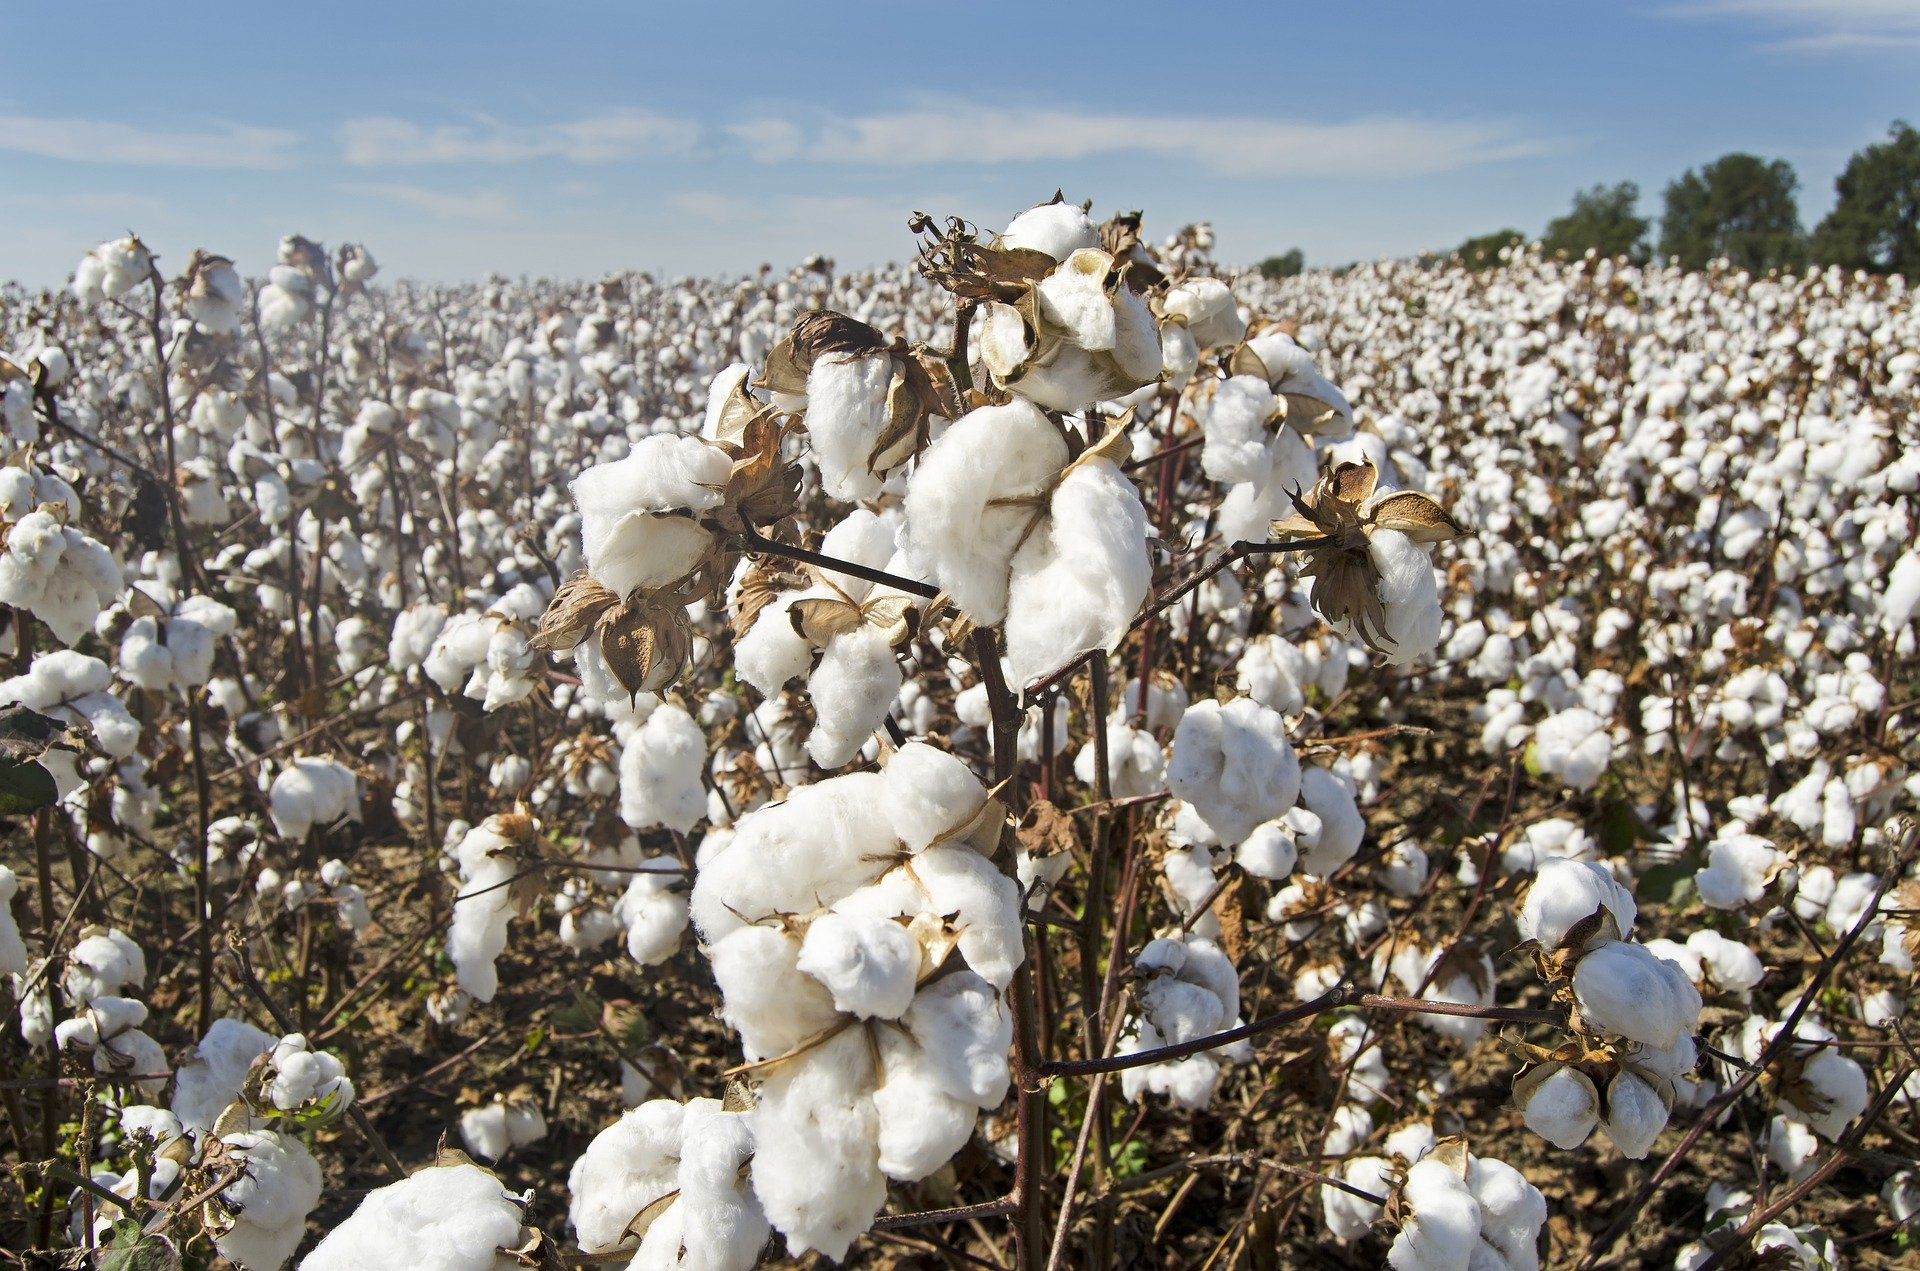 cotton-4649804_1920.jpg